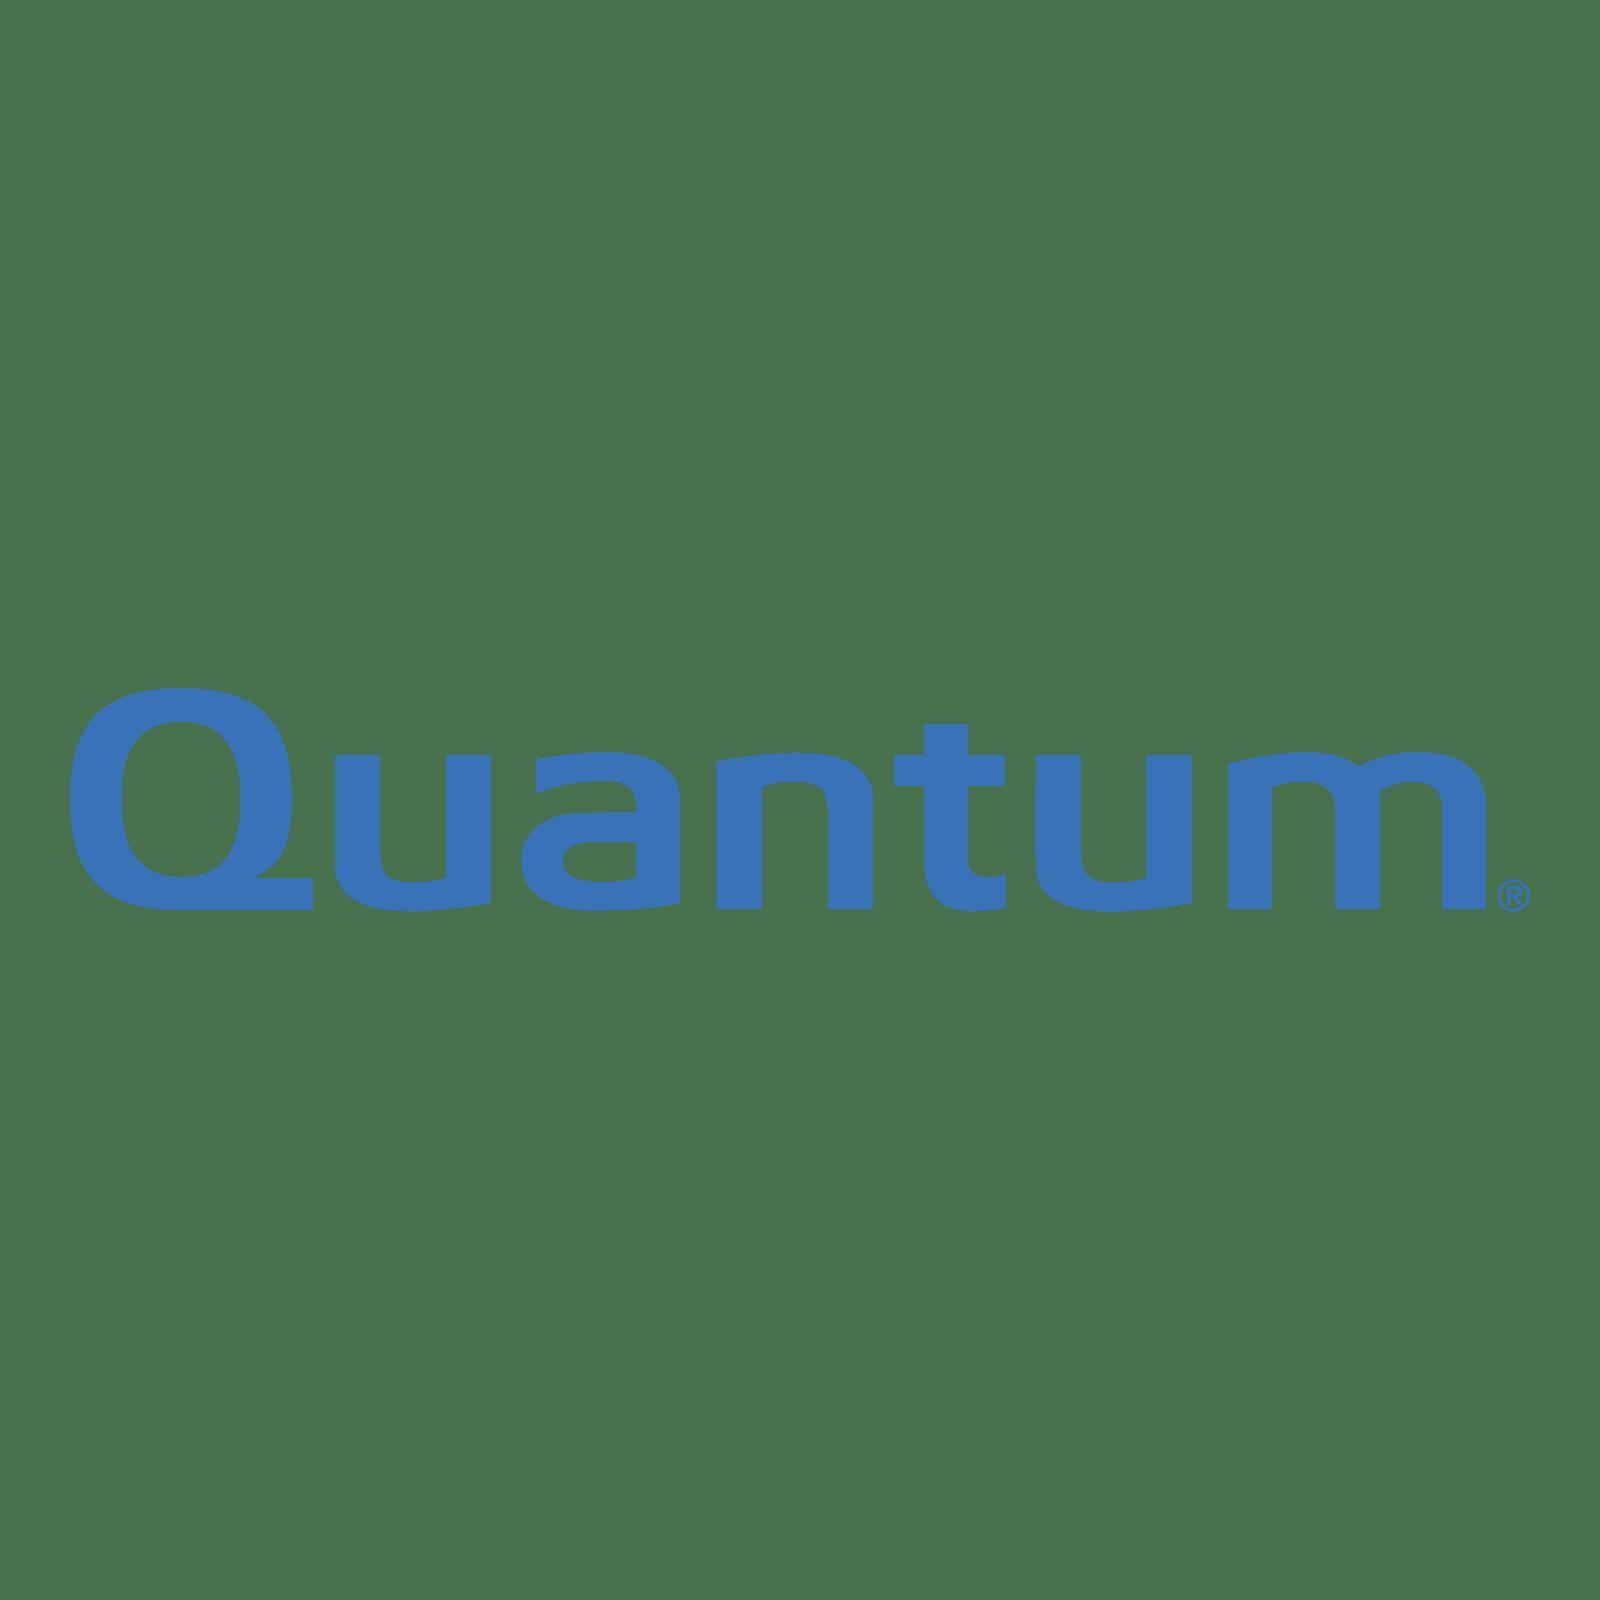 quantum-logo-png-transparent